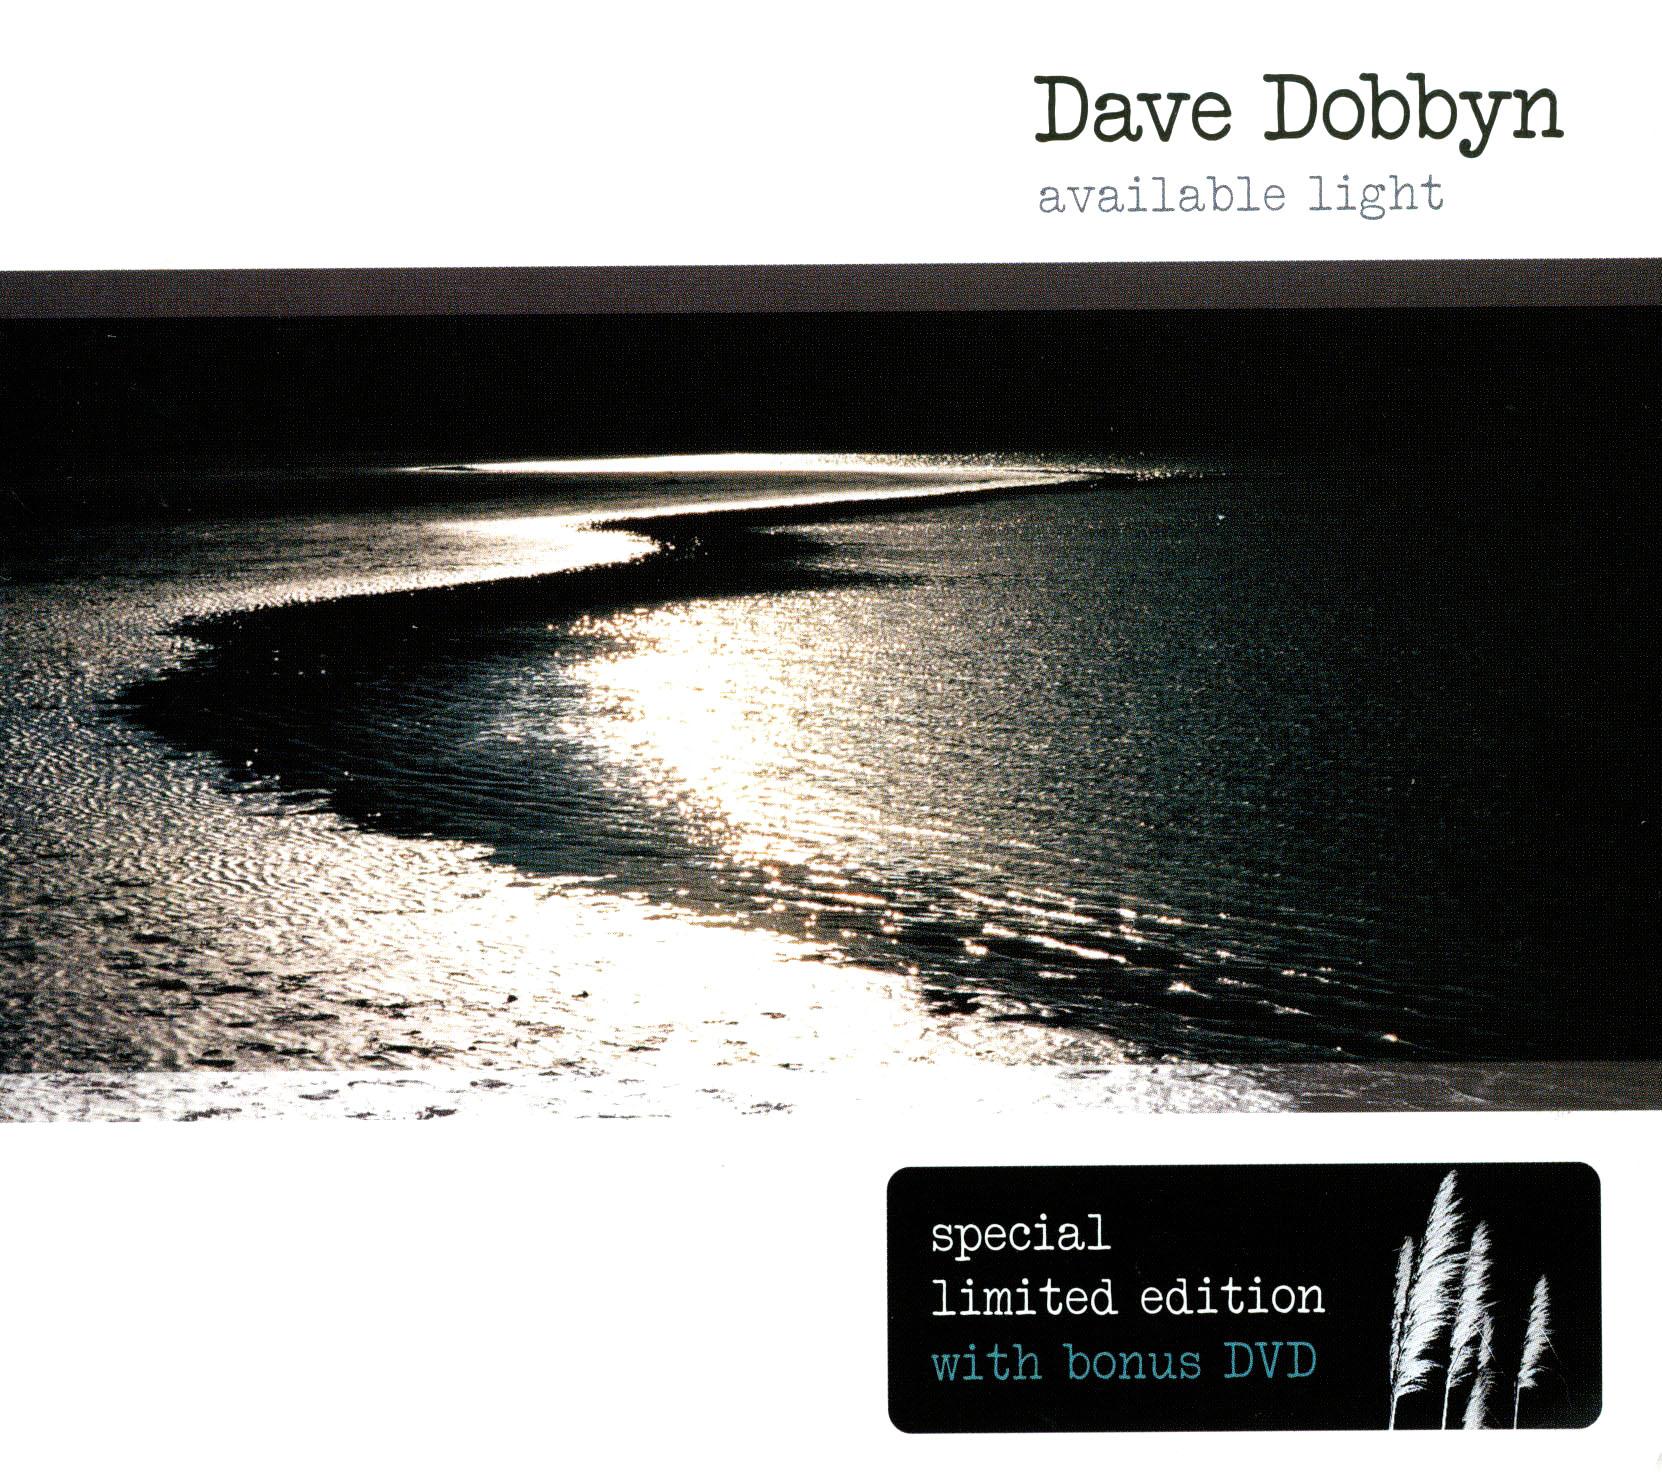 Dave Dobbyn: Available Light